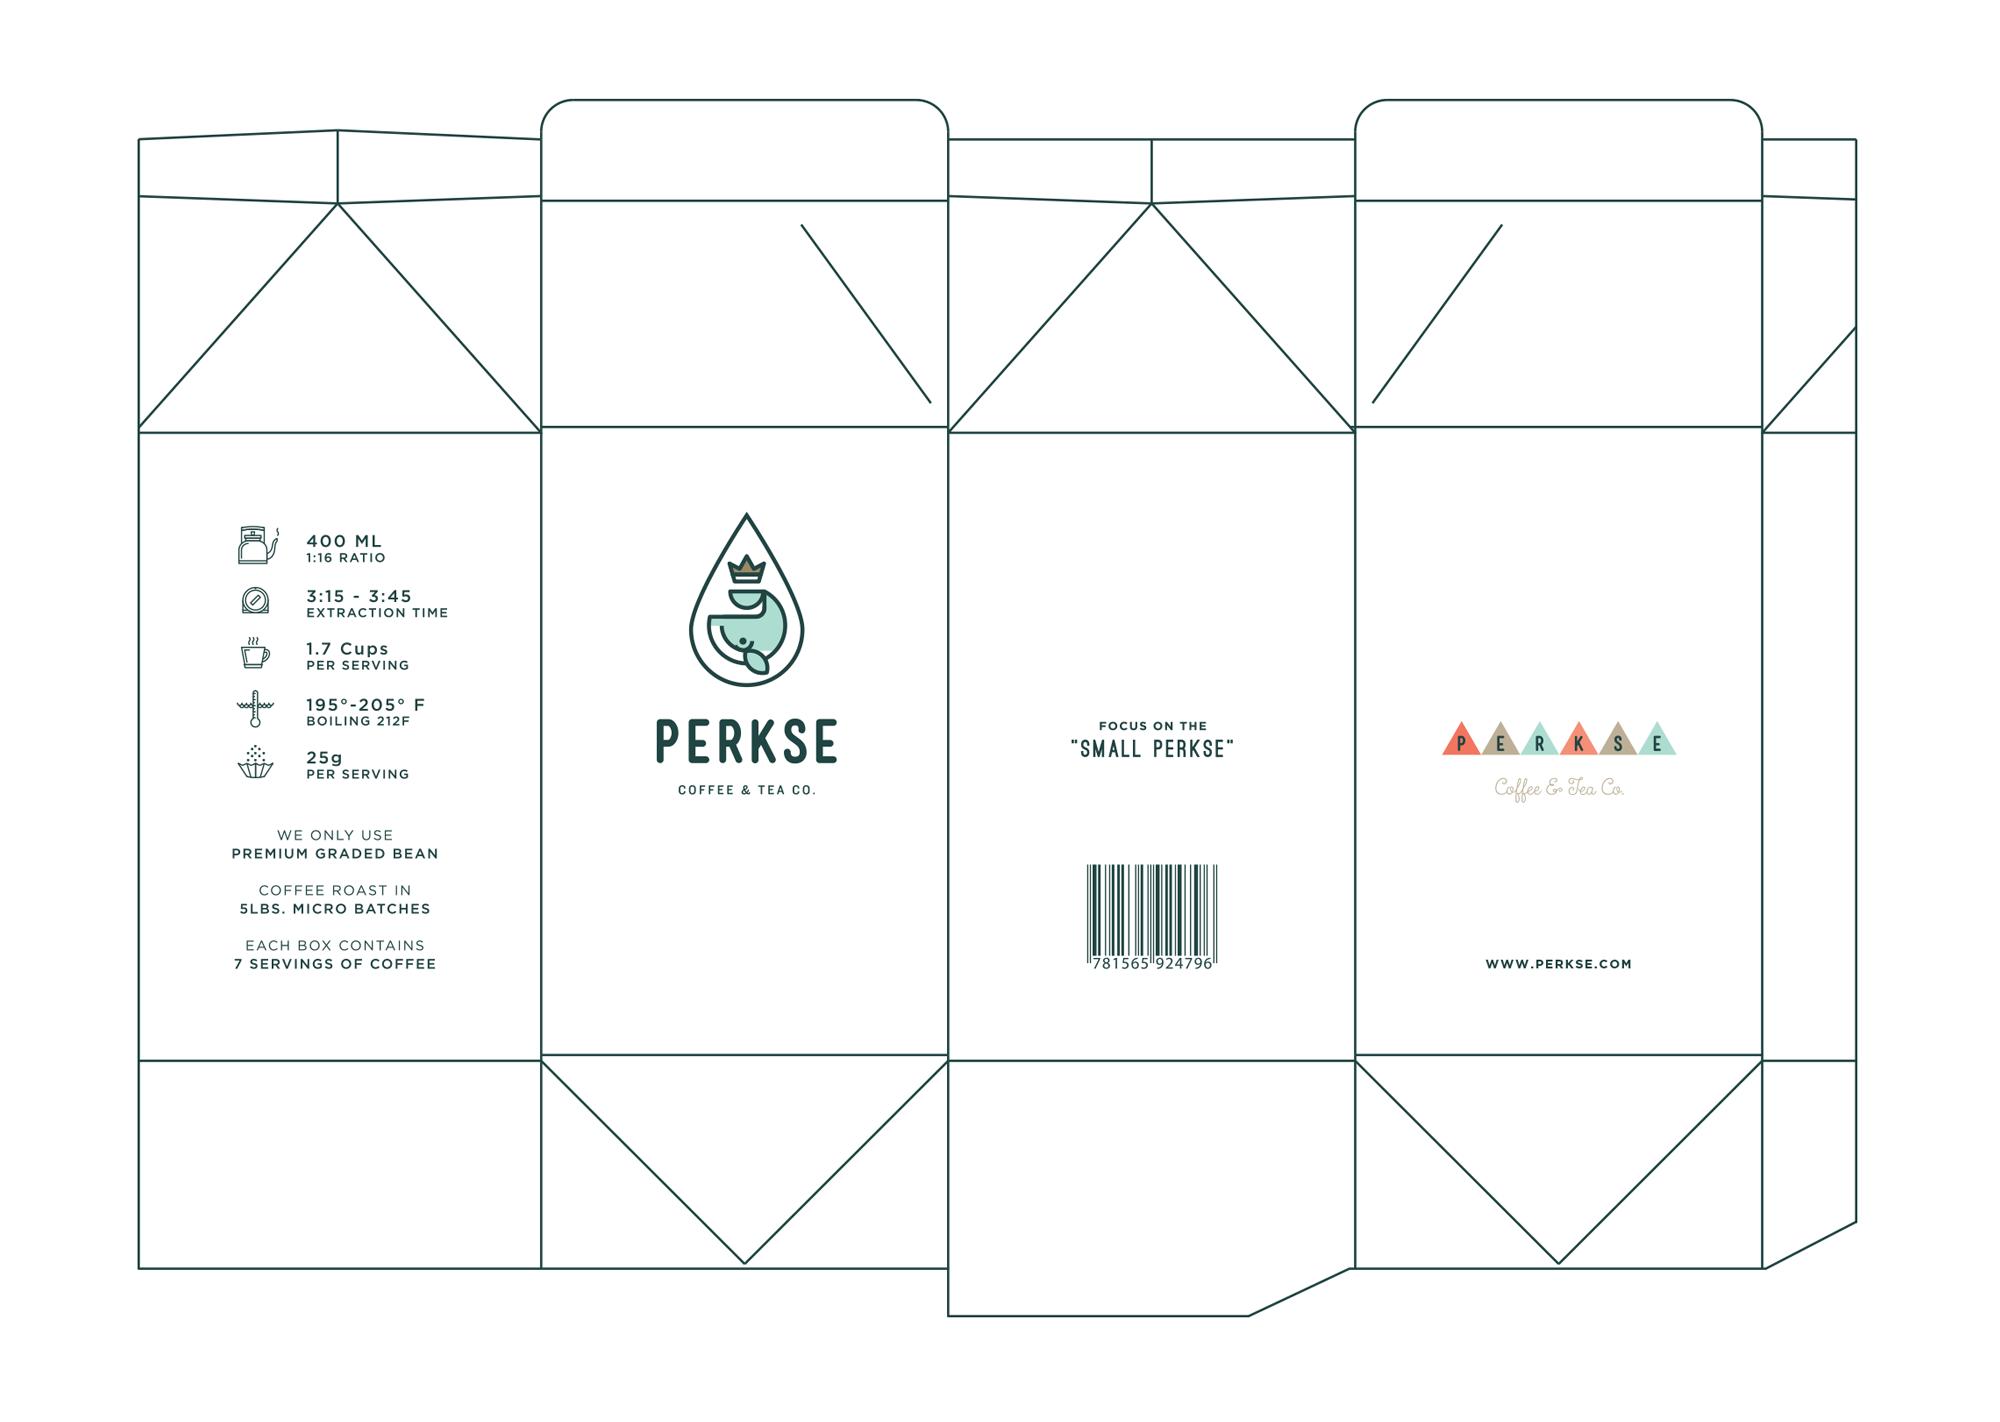 pocket juice instructions pdf